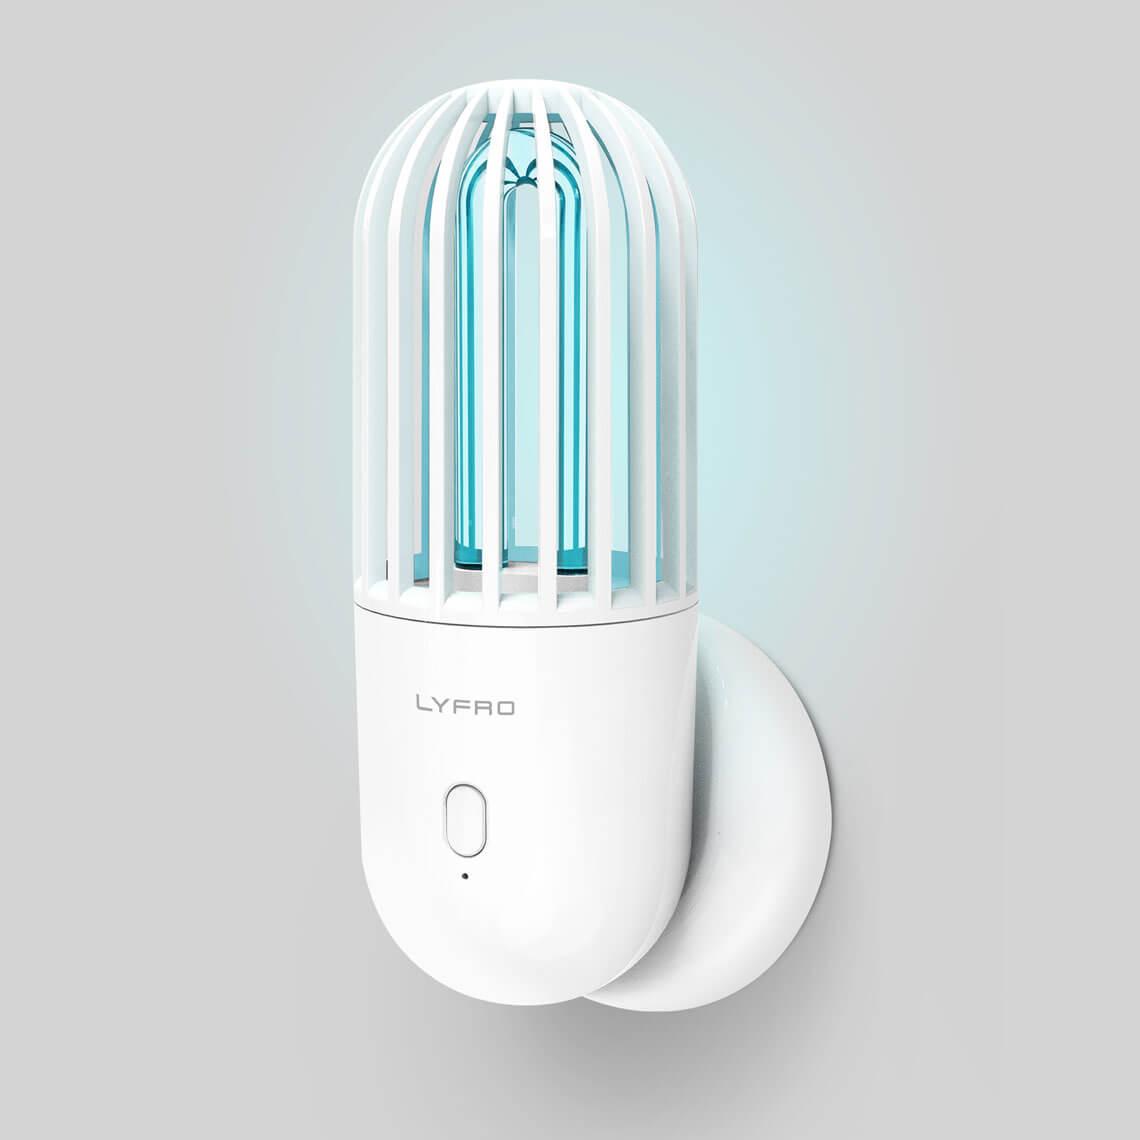 لامپ ضد عفونی کننده اوزون و UVC یونیک مدل Lyfro Hova